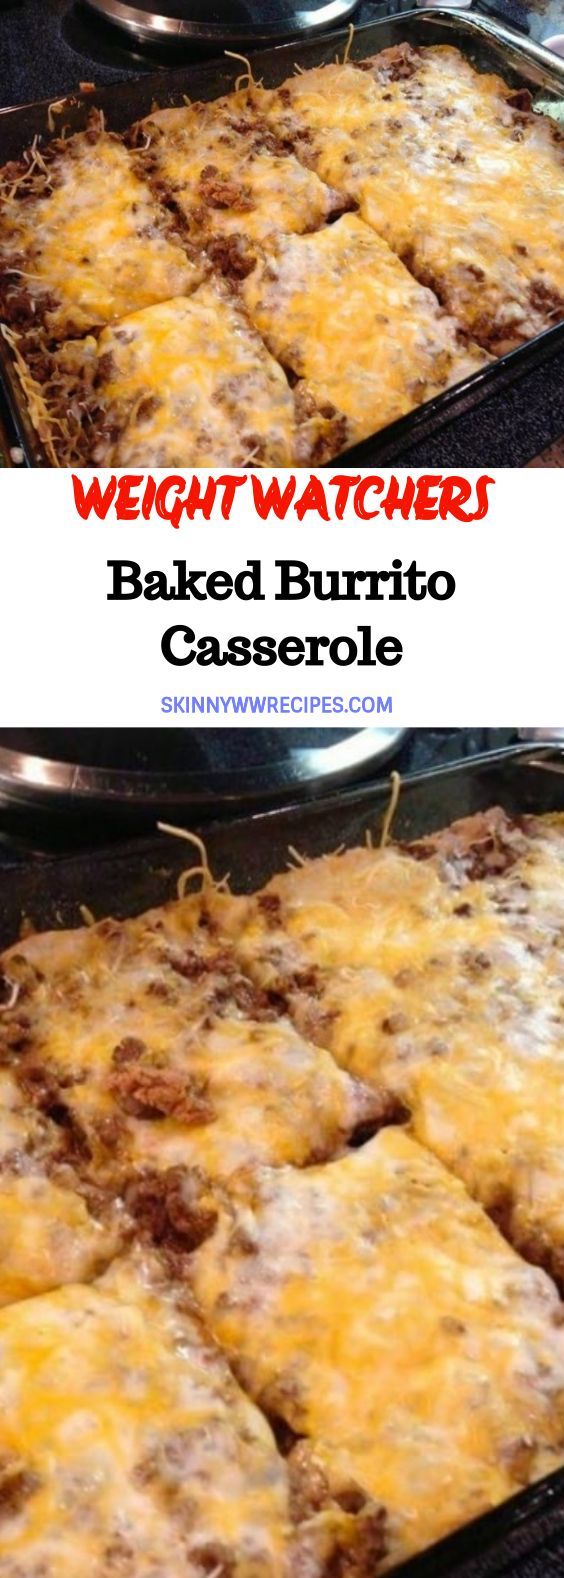 Baked Burrito Casserole images